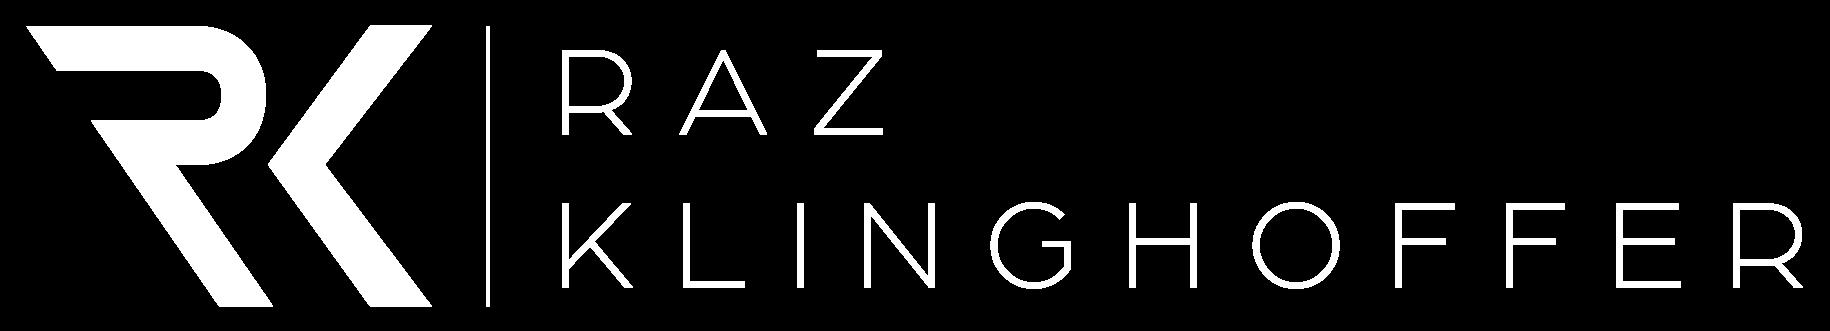 Raz Klinghoffer - Recording Studio, Music Producer - Los Angeles - Logo